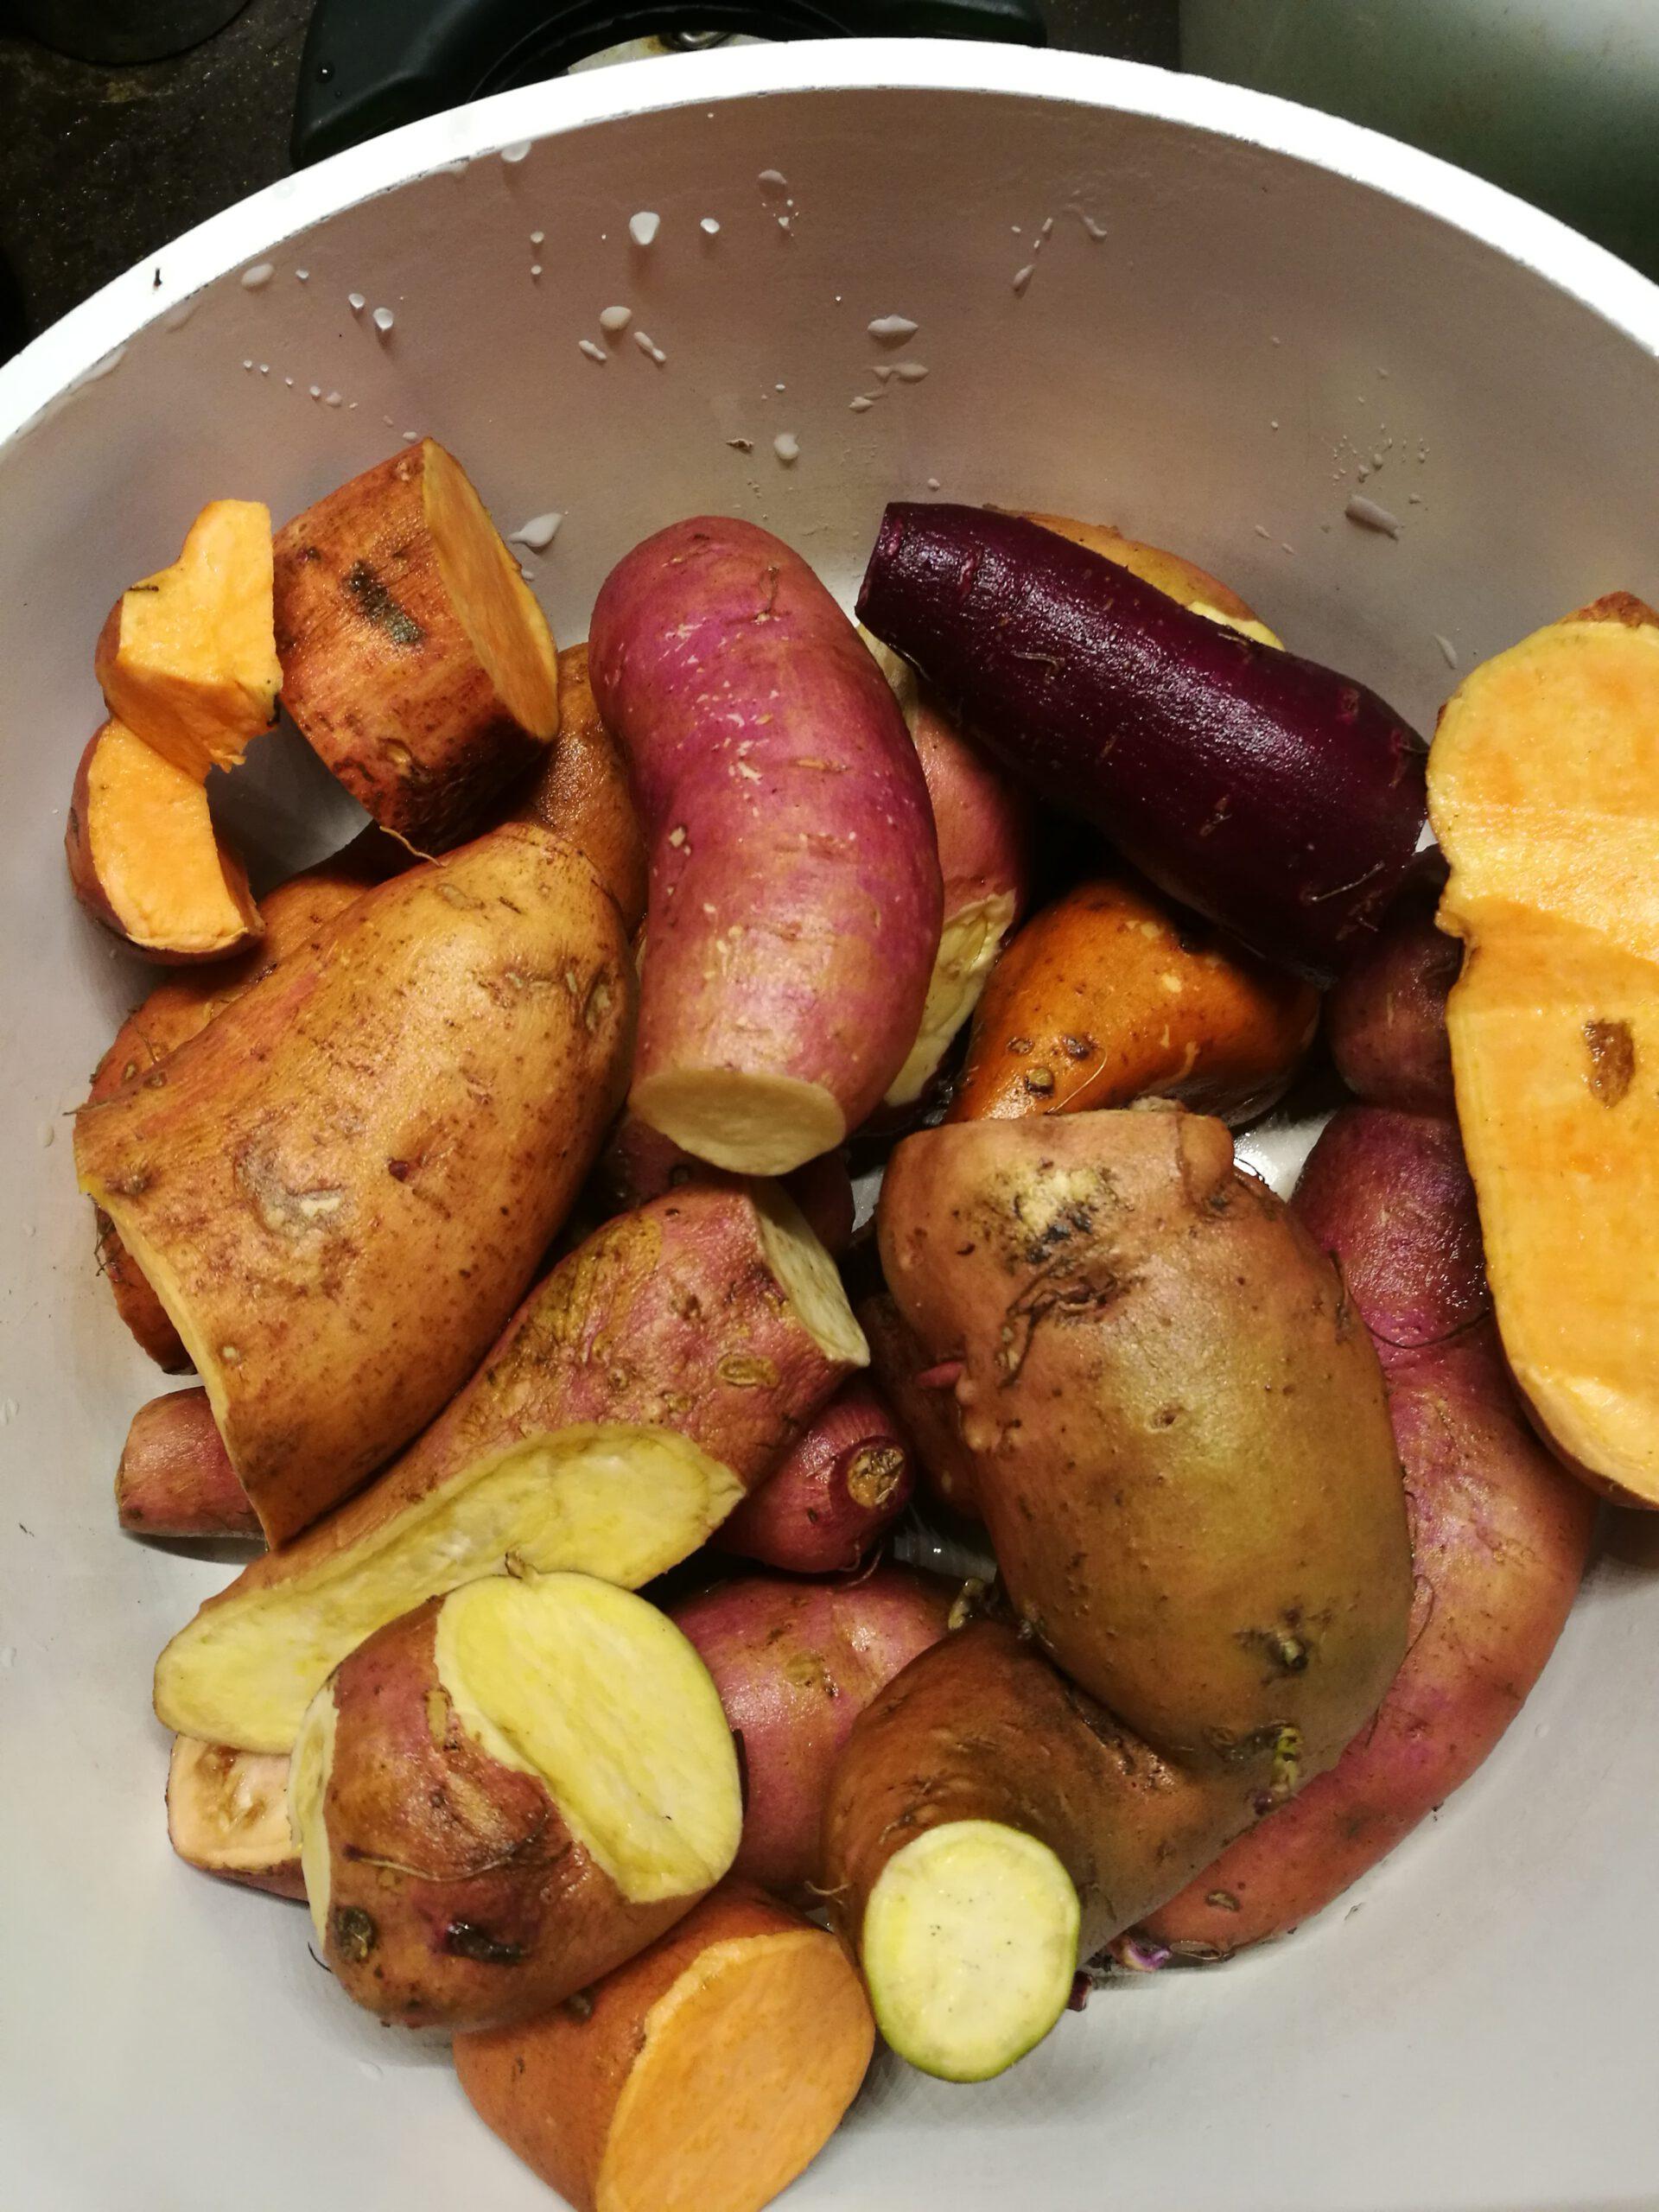 You are currently viewing Süßkartoffelbrei oder Süßkartoffelpüree?